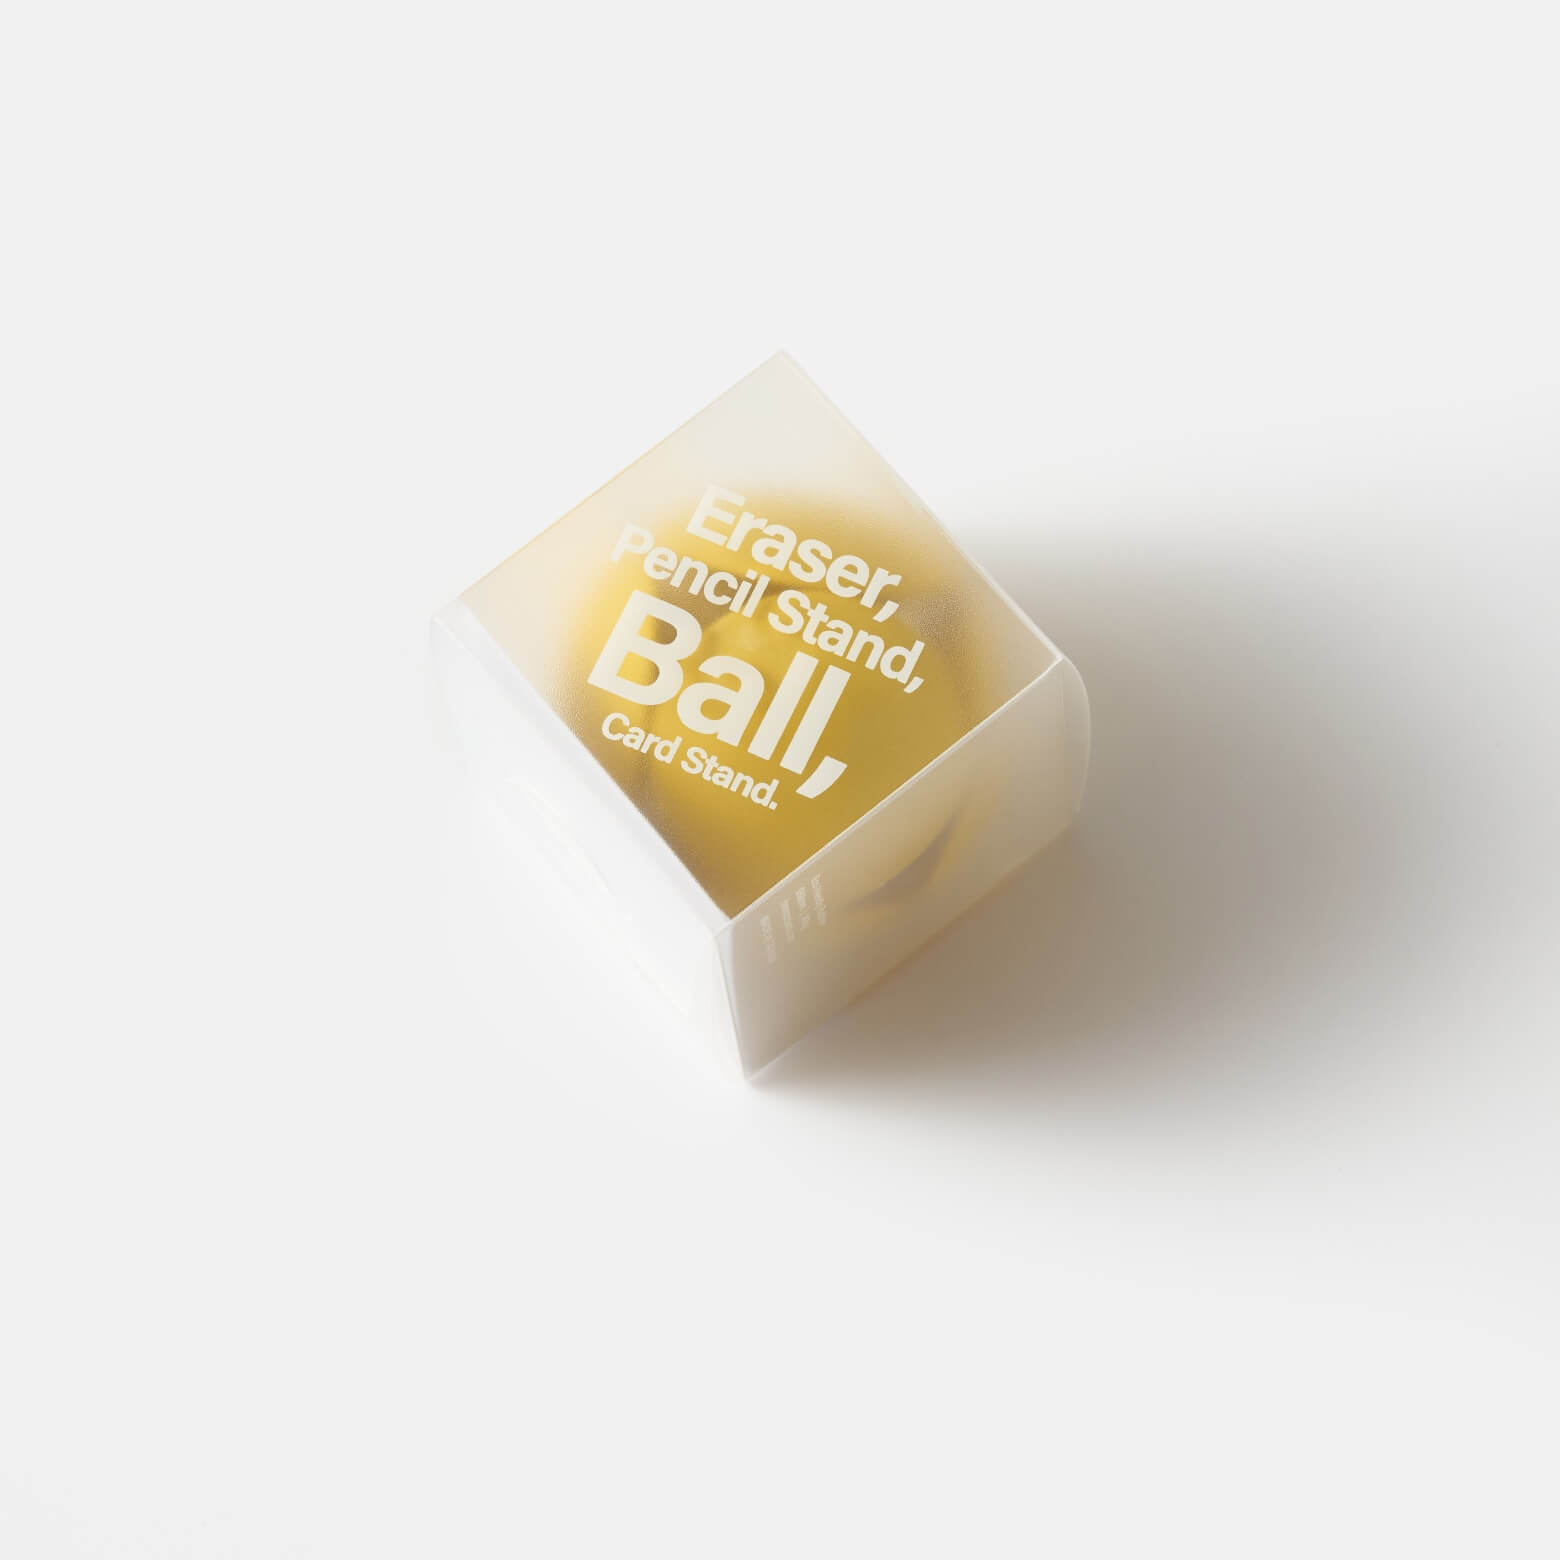 HMM Eraser Ball — ластик-подставка: жёлтый